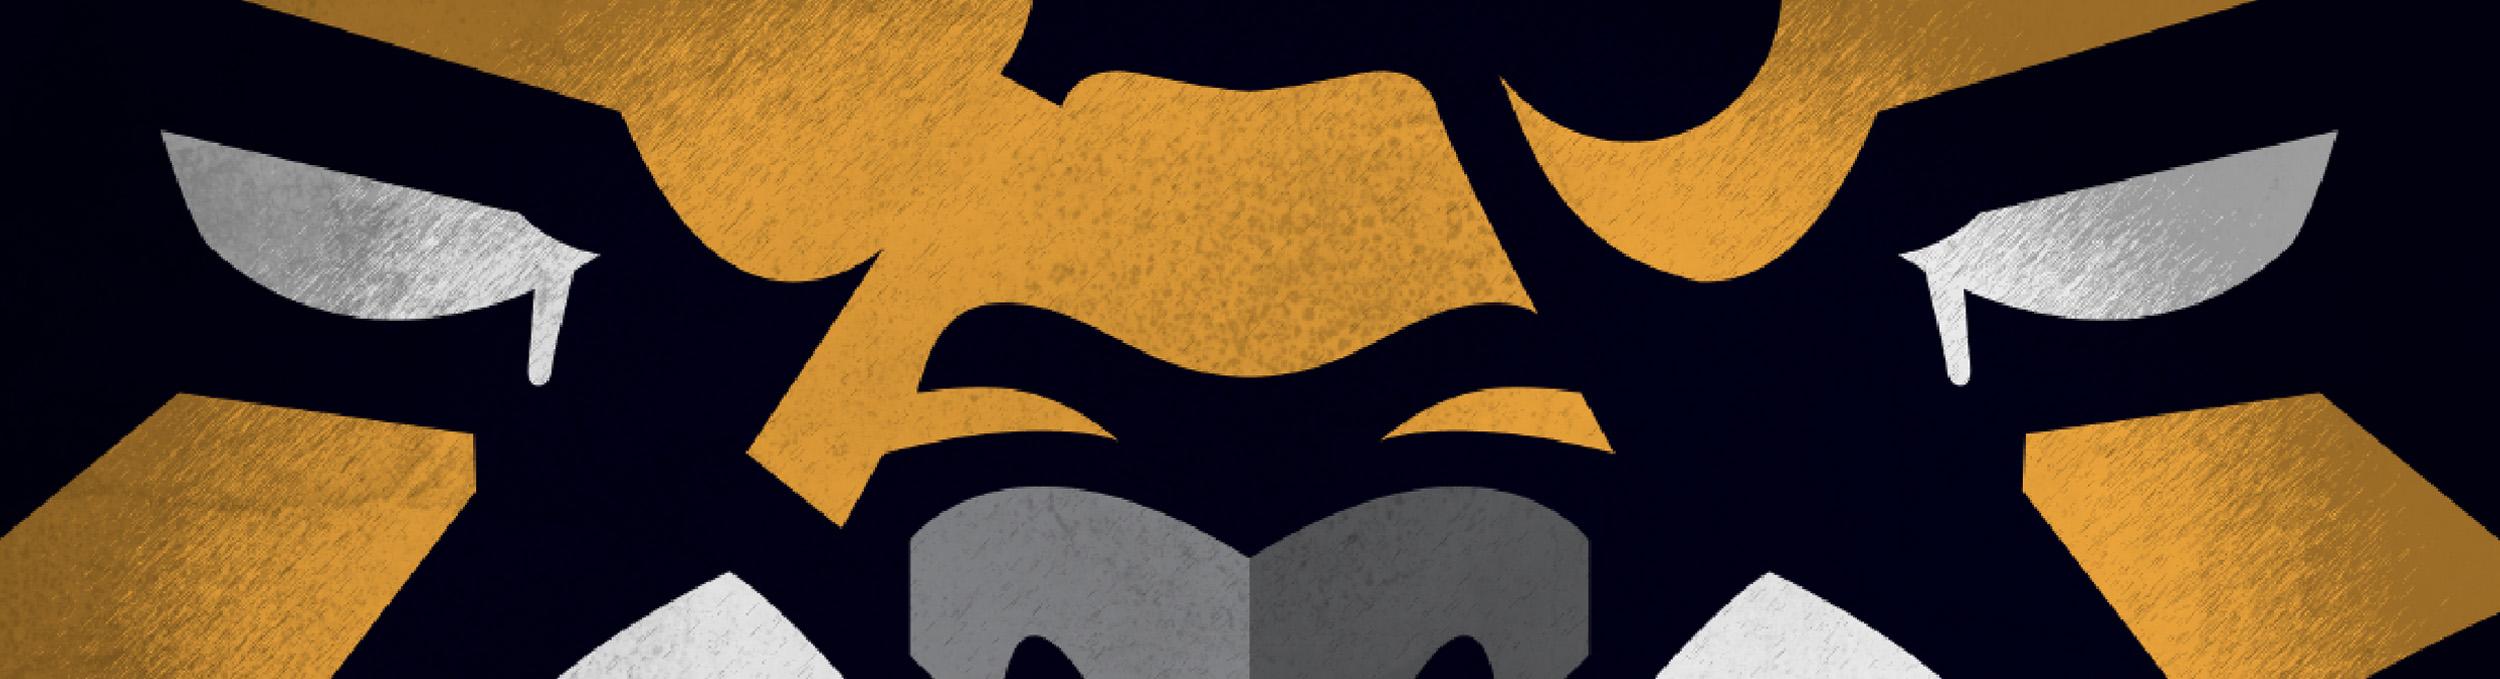 Saint Xavier University's new athletic logo